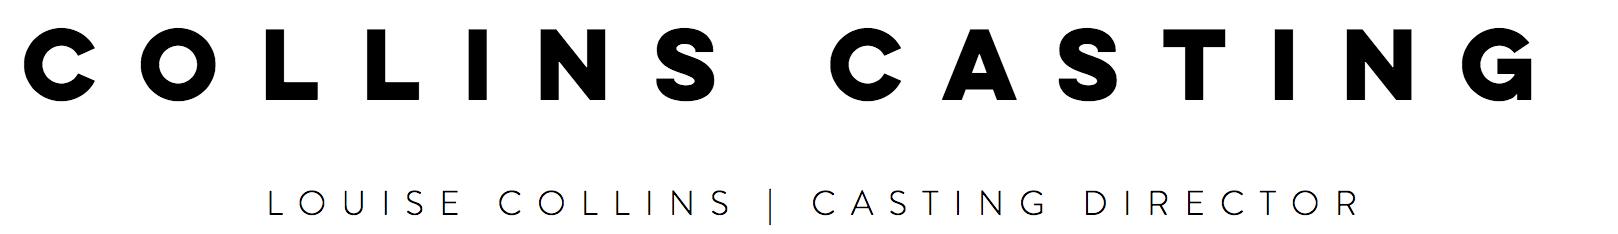 COLLINS CASTING